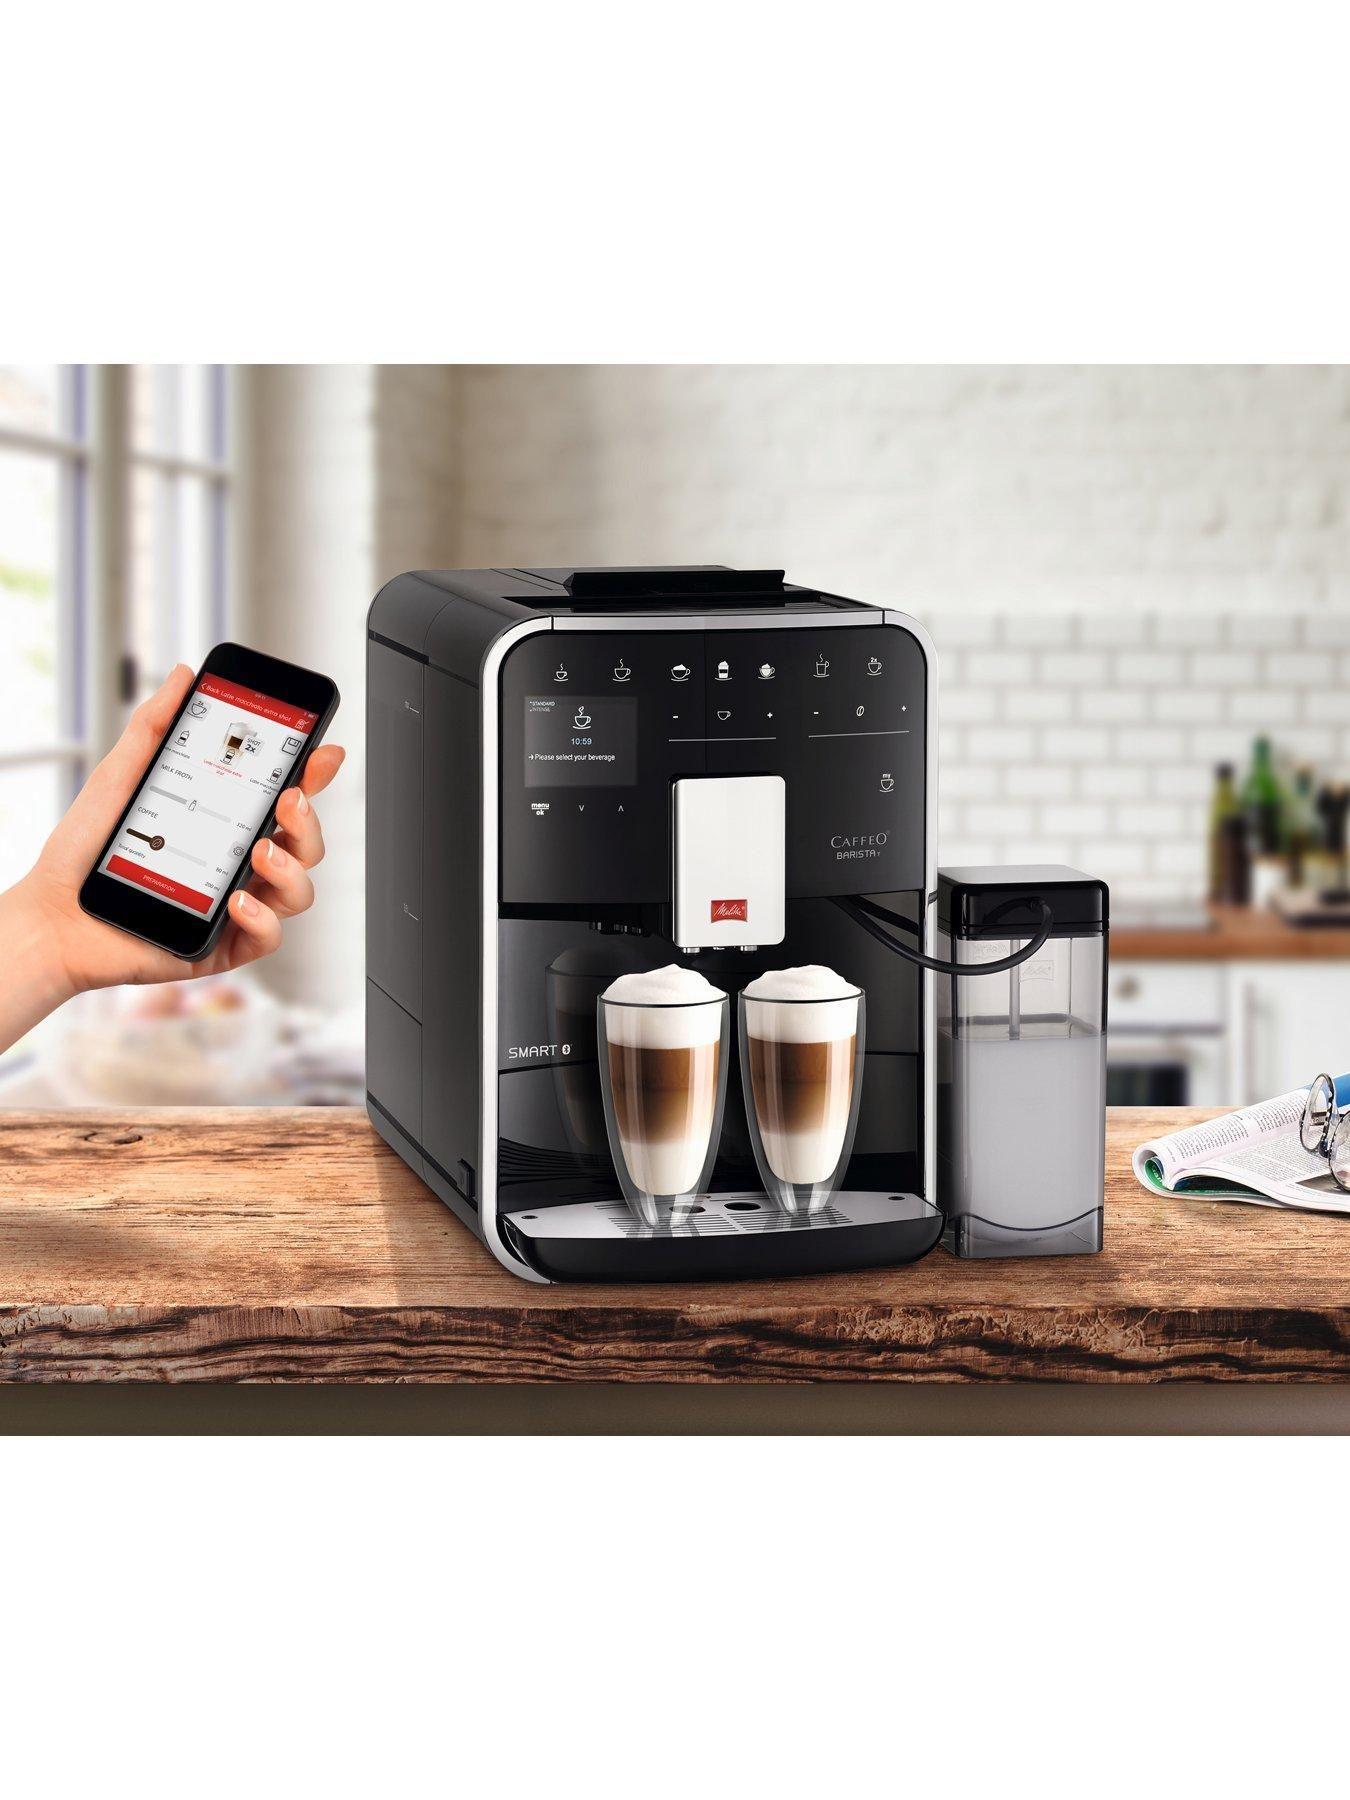 Womens Mens And Kids Fashion Furniture Electricals More Coffee Machine Automatic Coffee Machine Barista